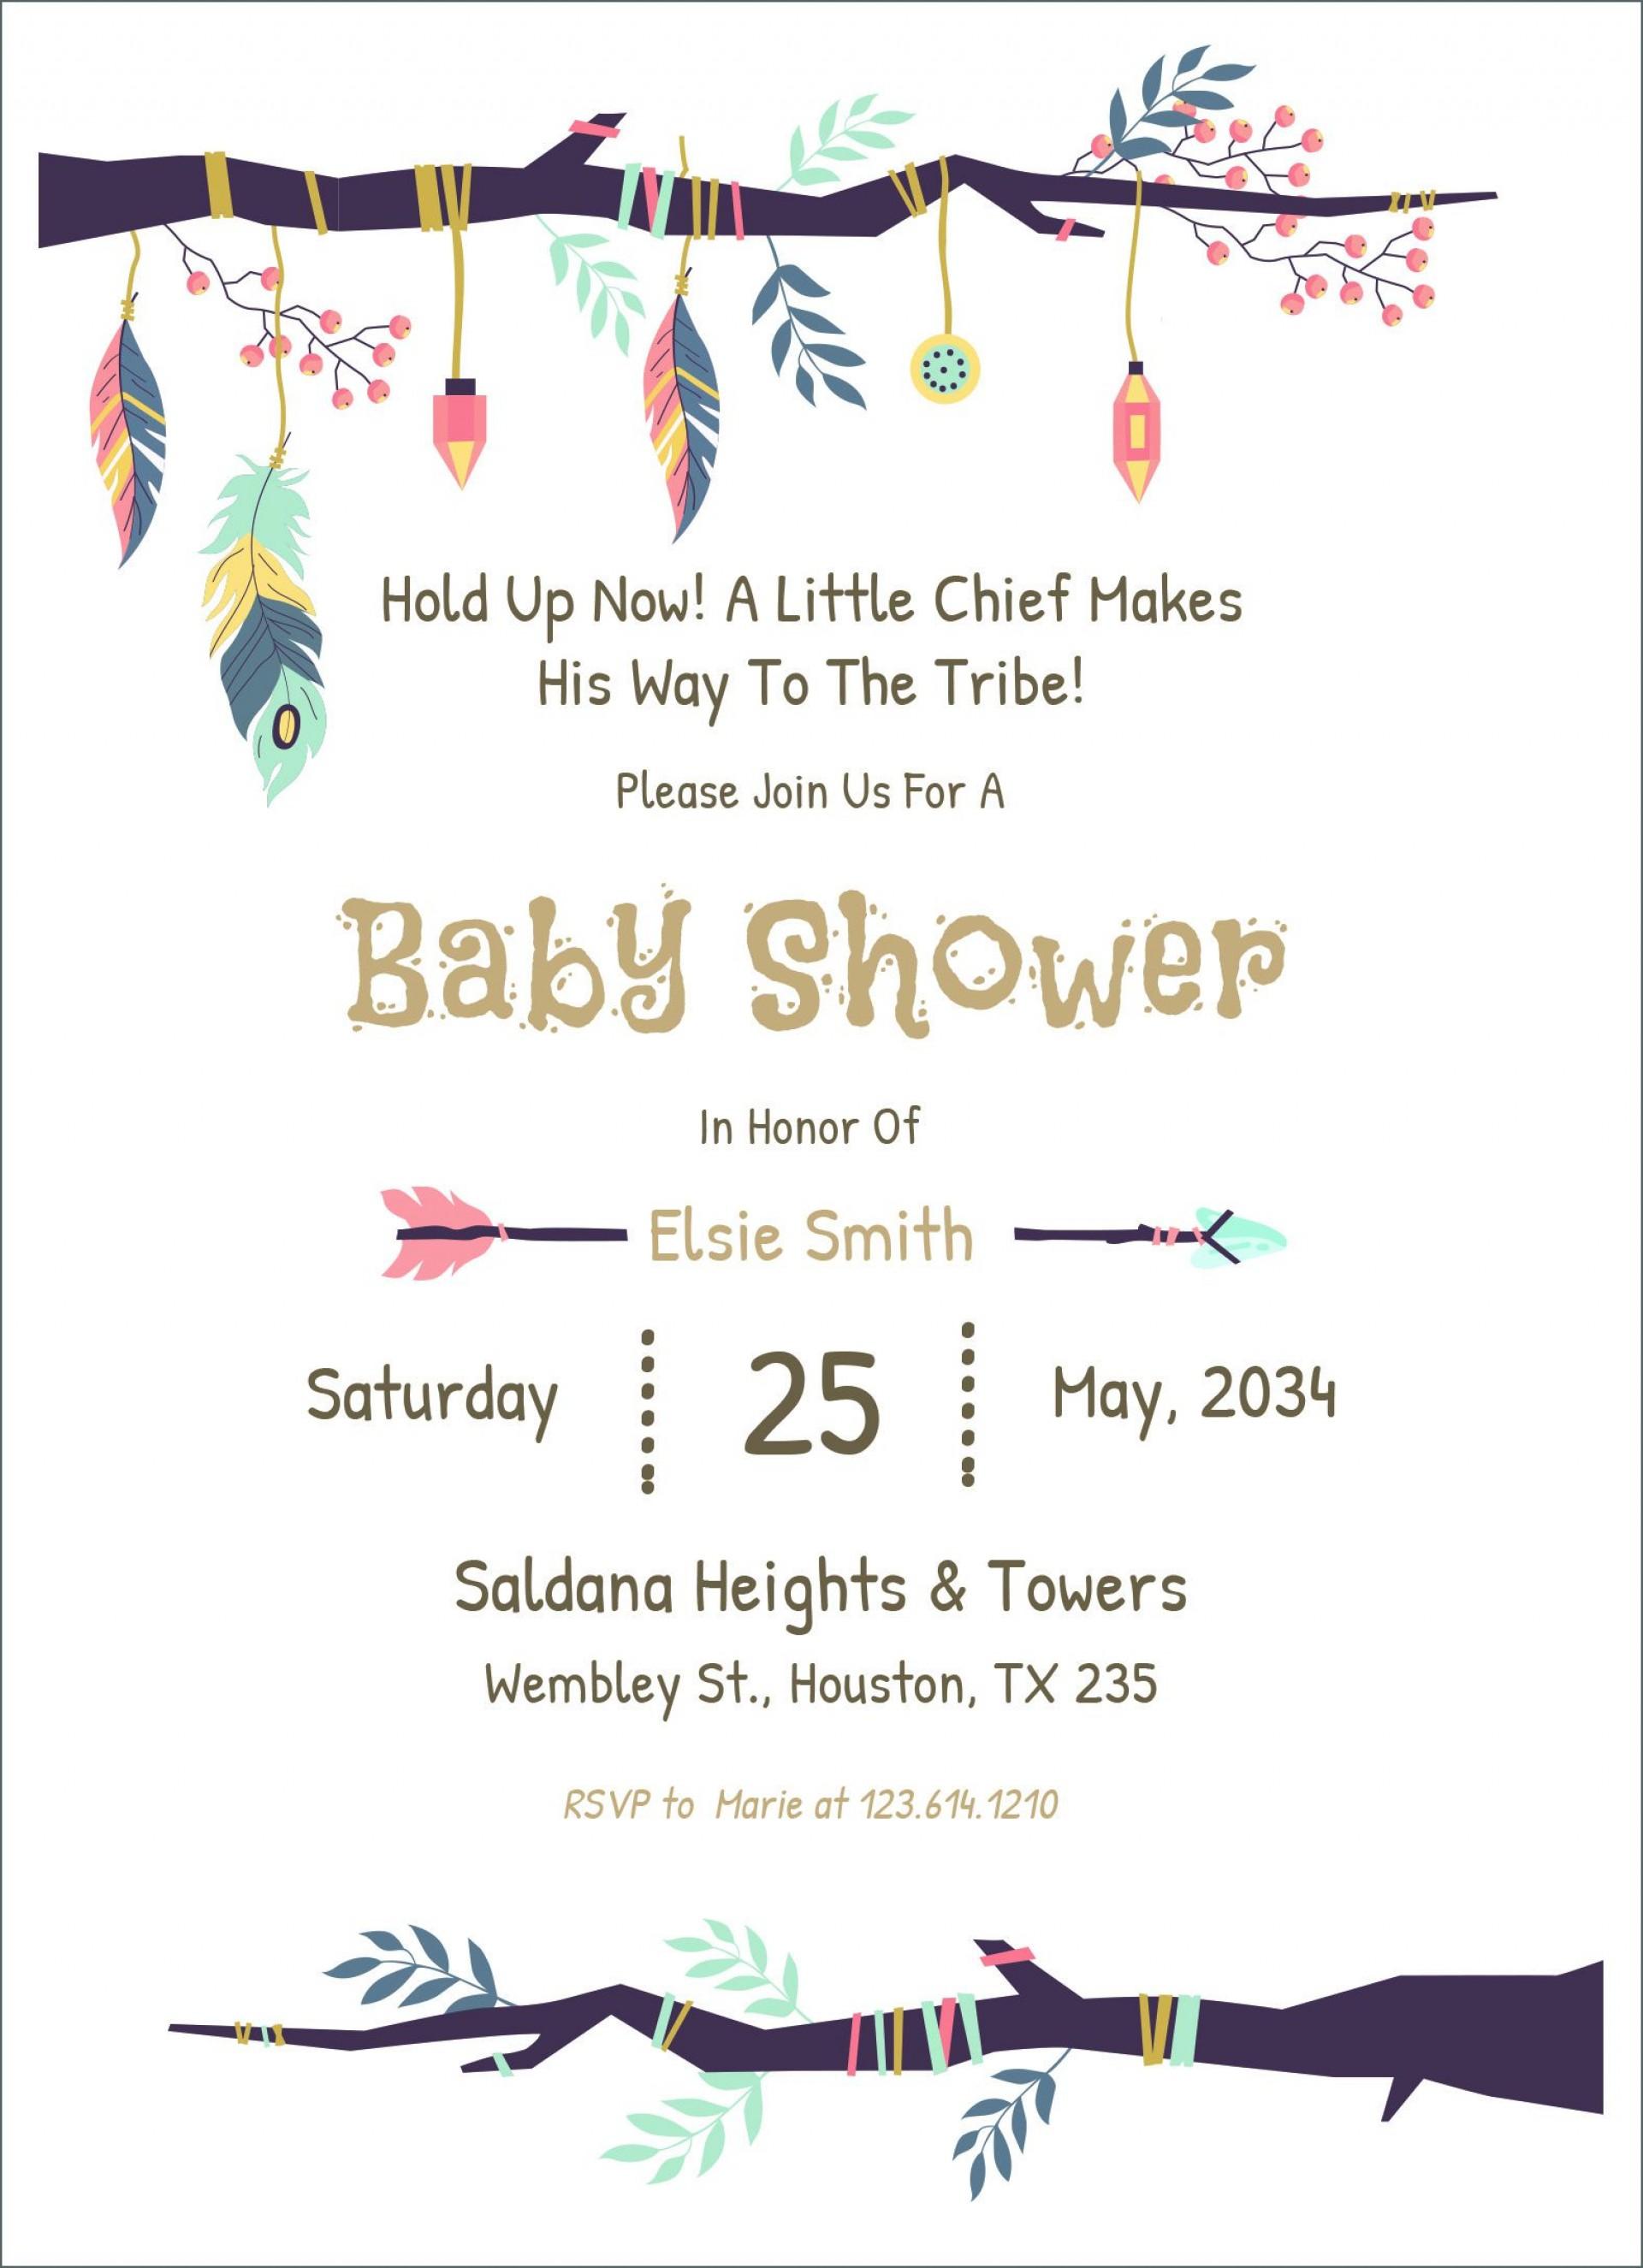 004 Incredible Diy Baby Shower Invitation Template Sample  Templates Diaper1920